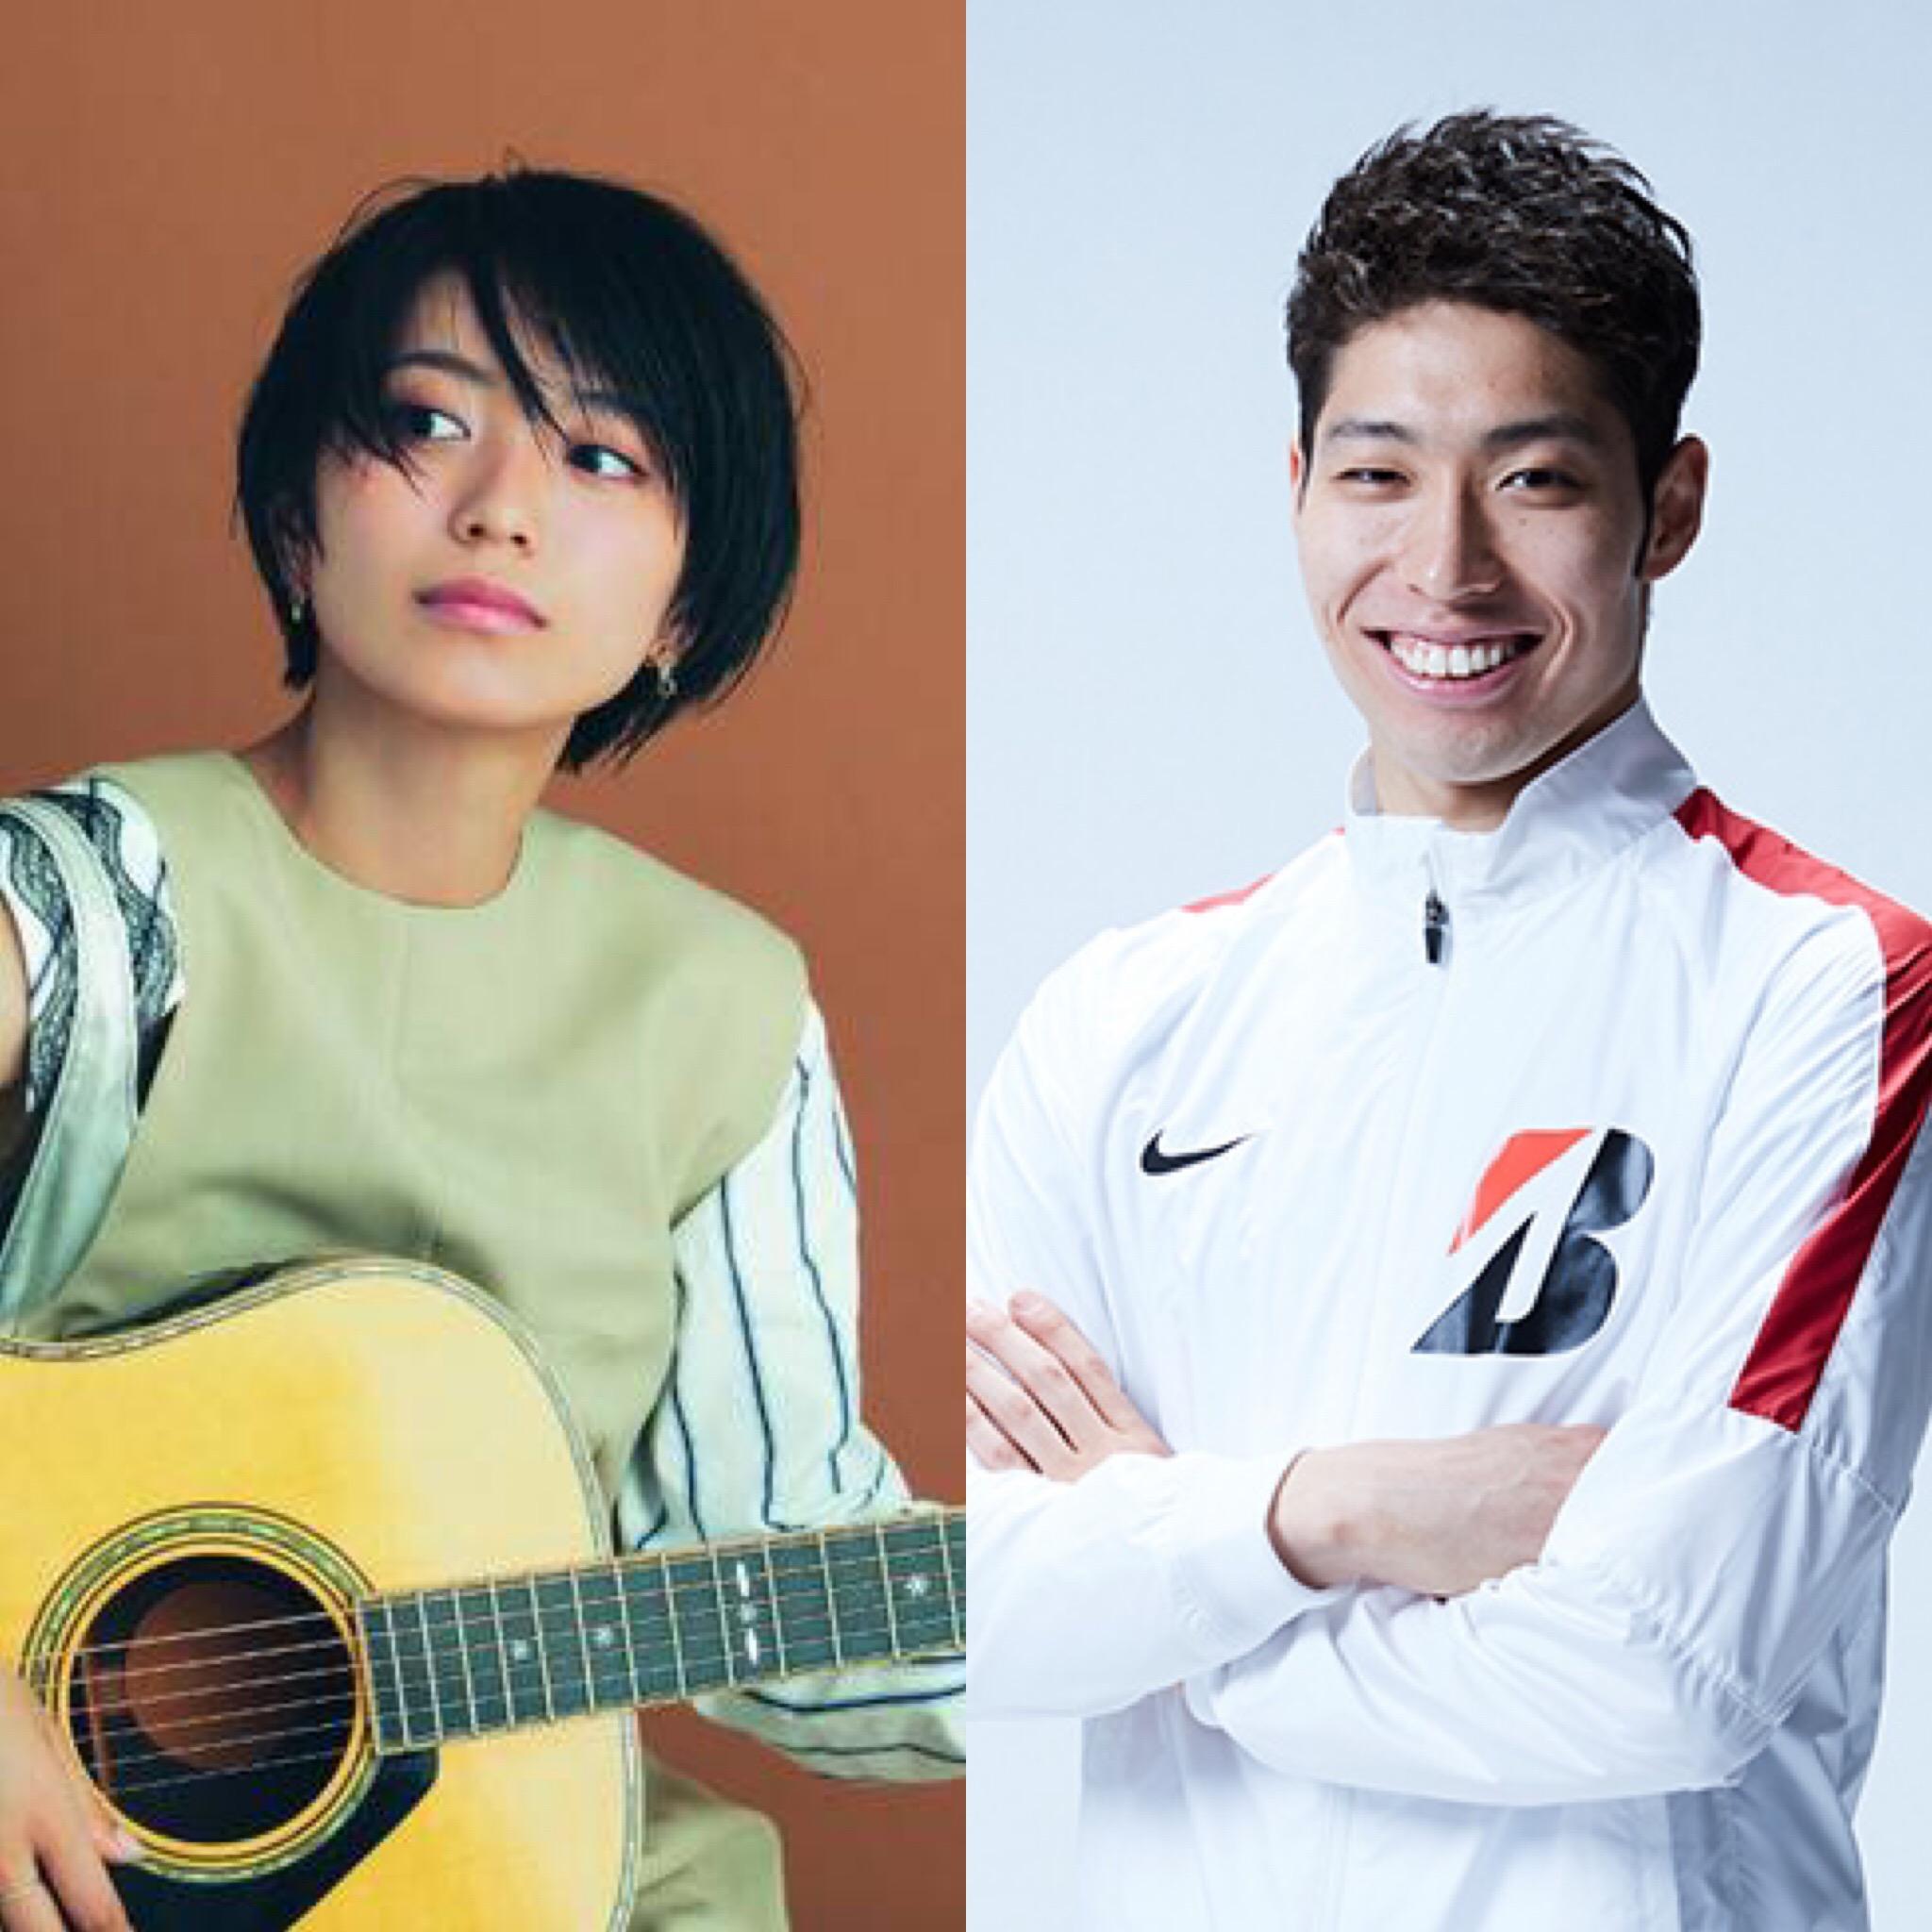 miwa married Olympic swimmer Kosuke Hagino, she's also pregnant!